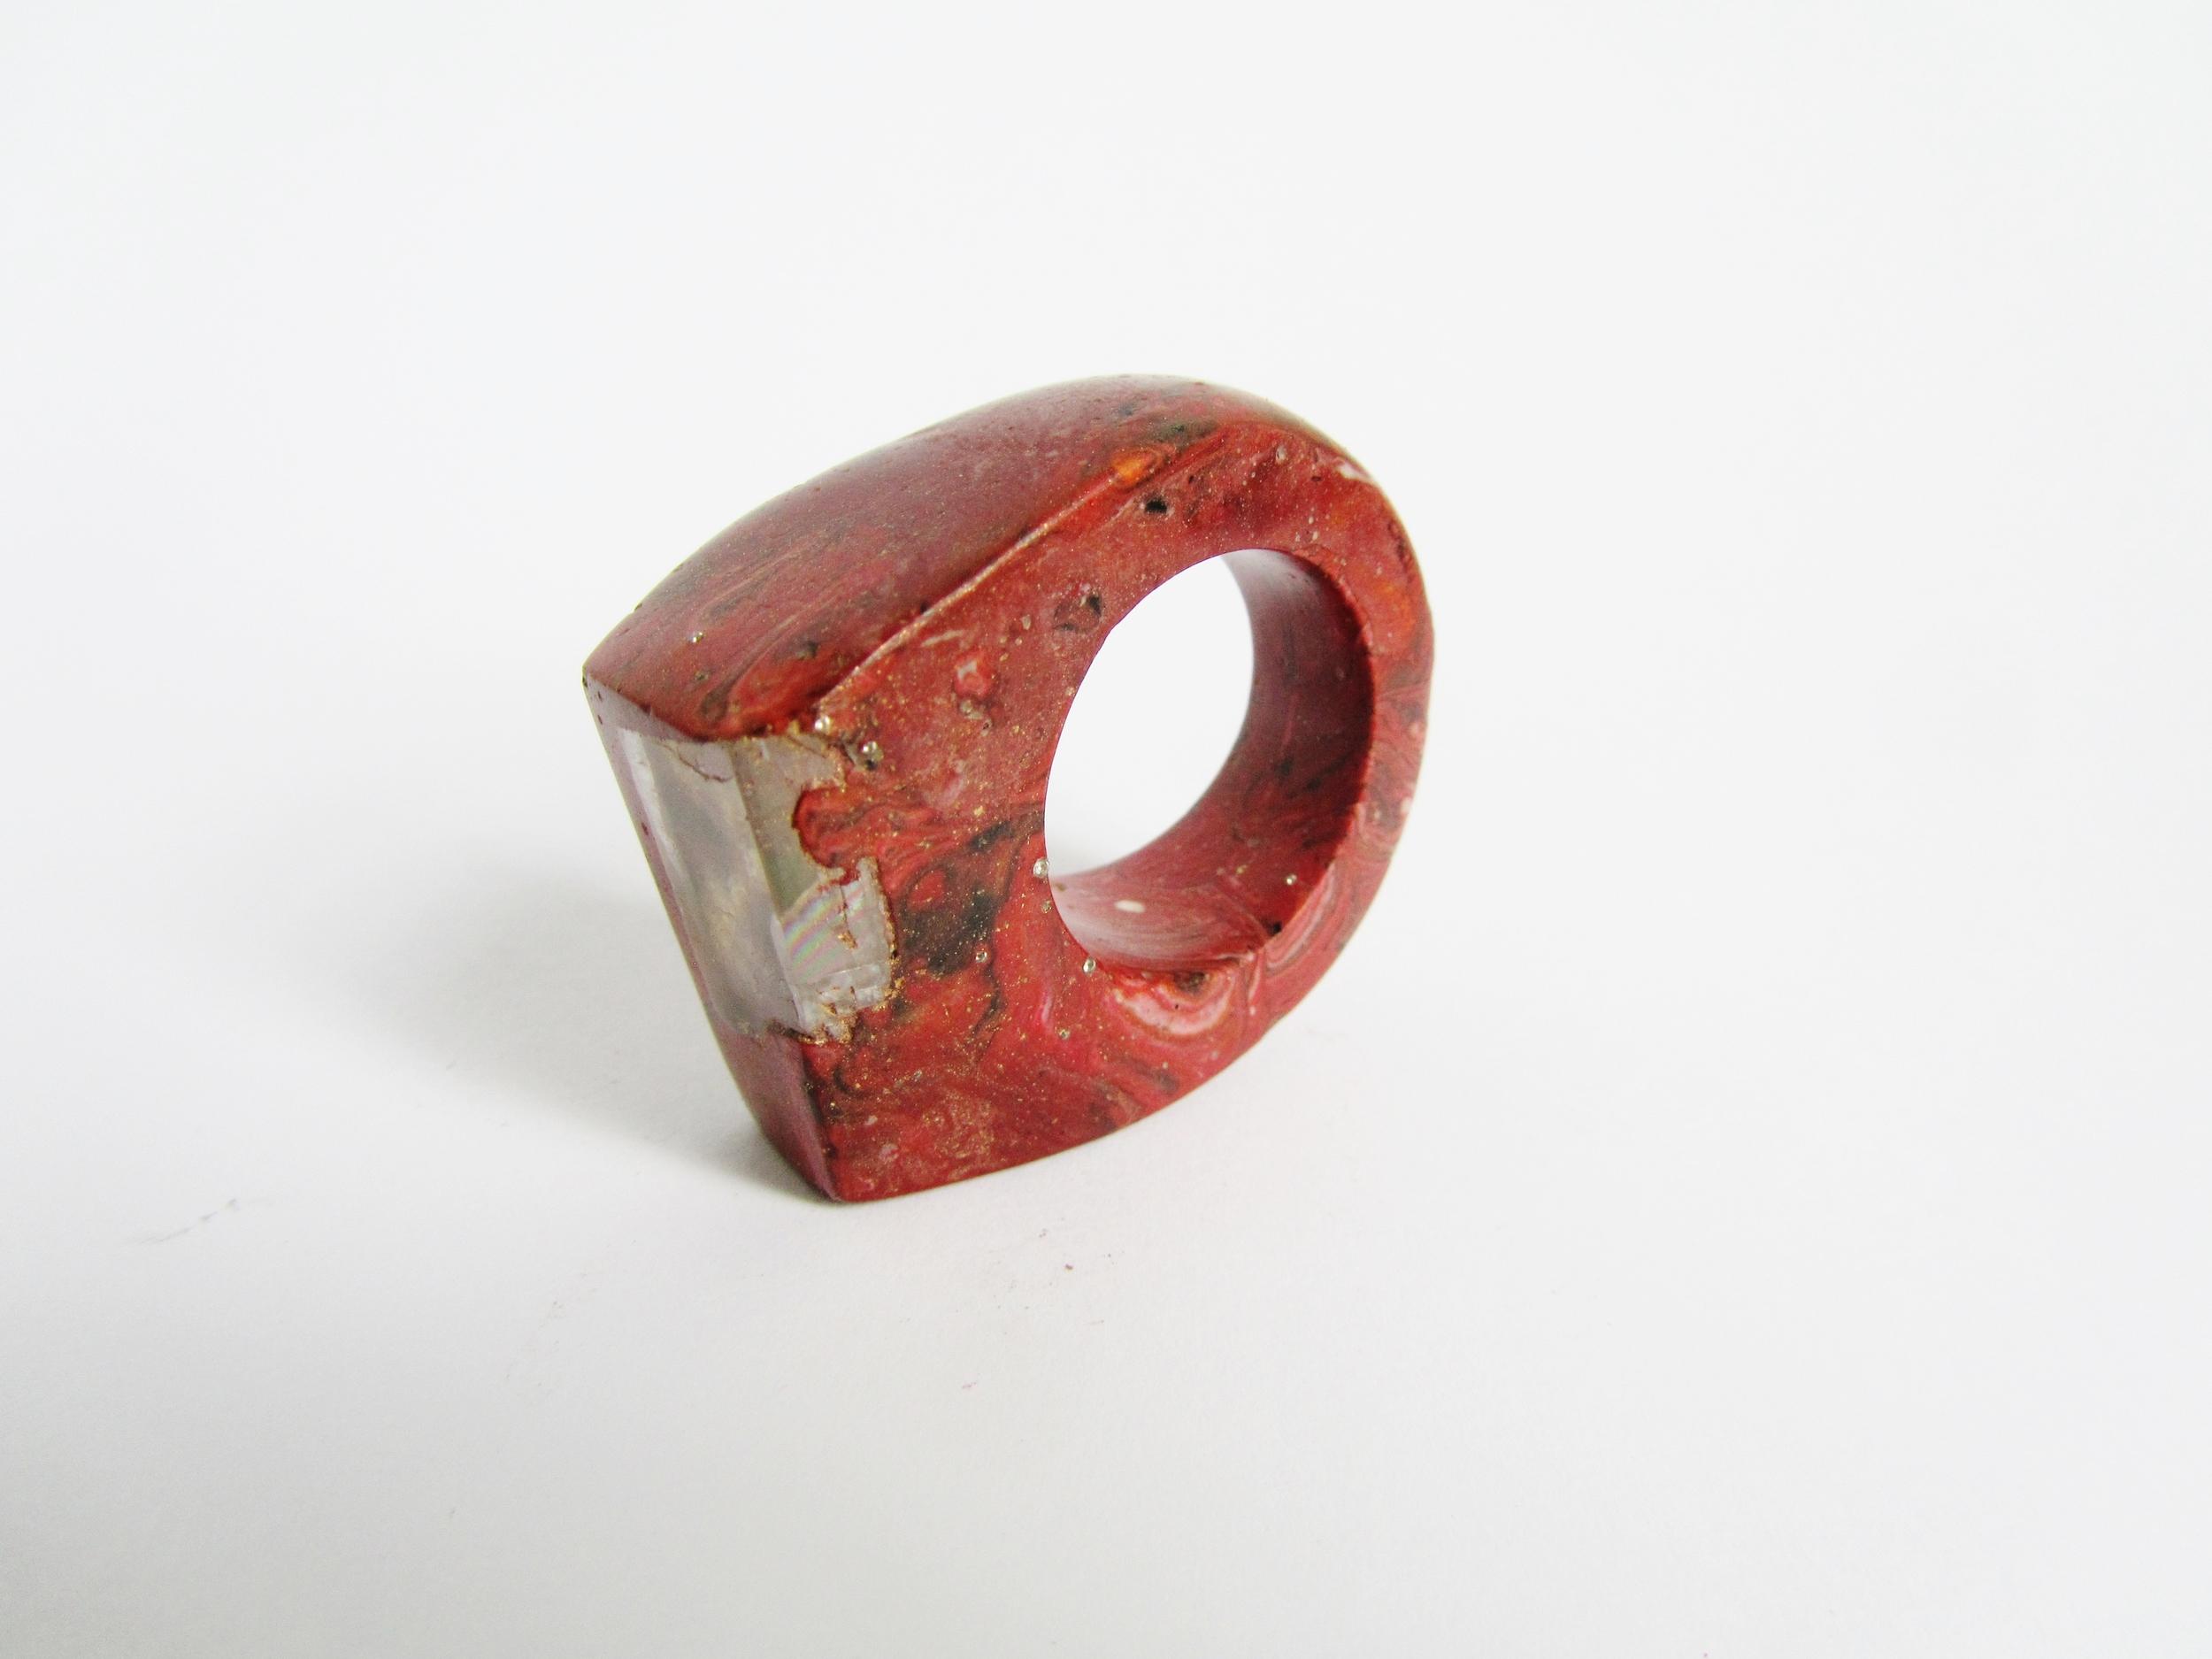 jade mellor bespoke red ring iceland spar.JPG